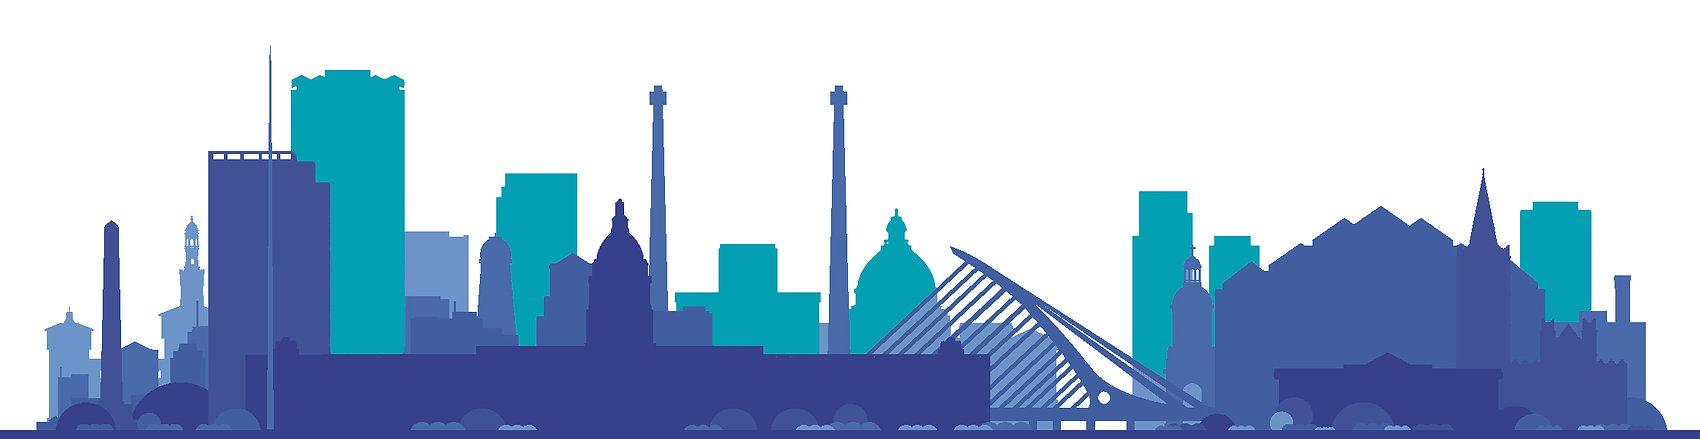 Dublin skyline.jpg